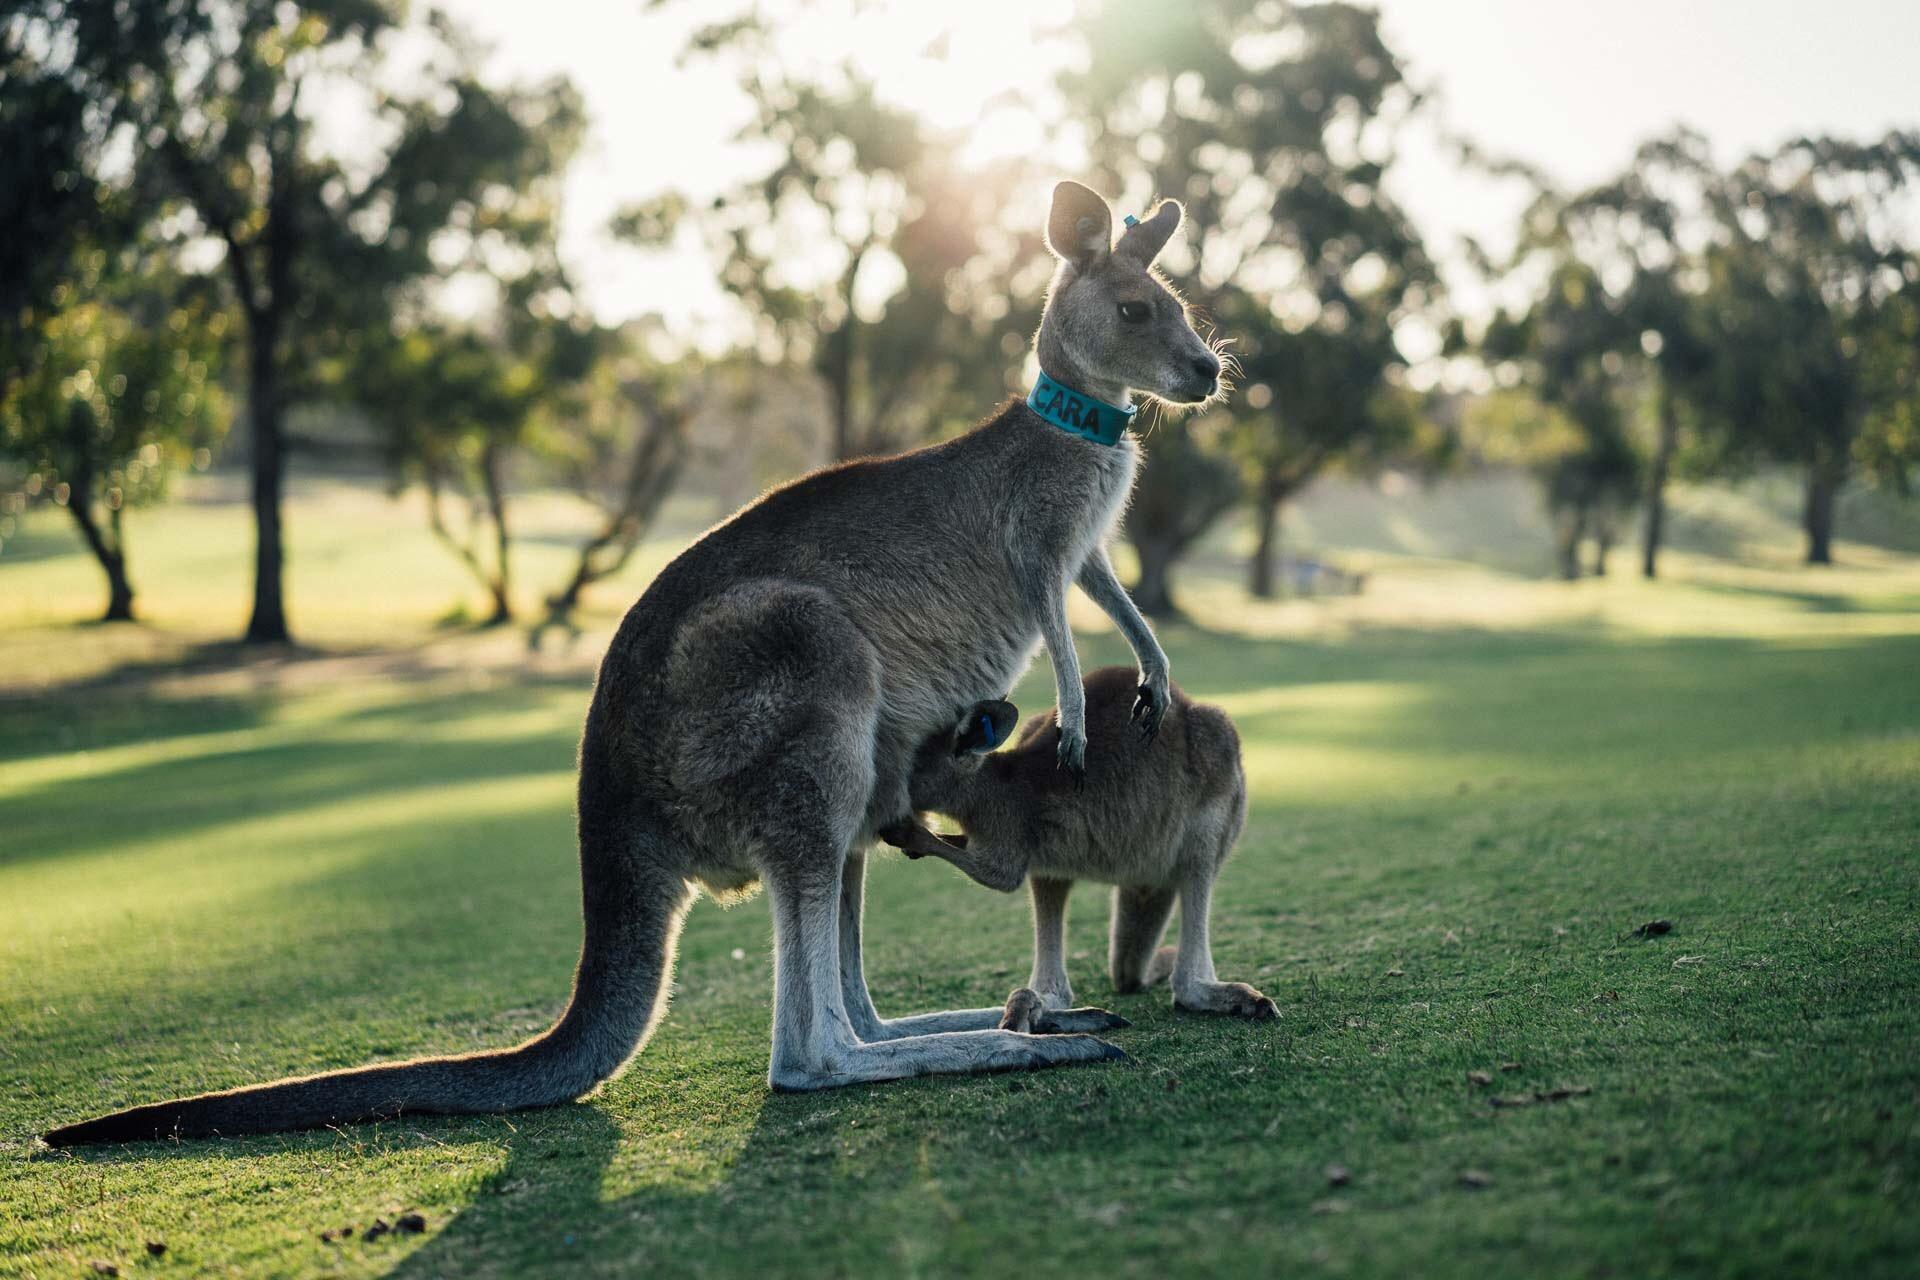 Kangaroo Australia.JPG